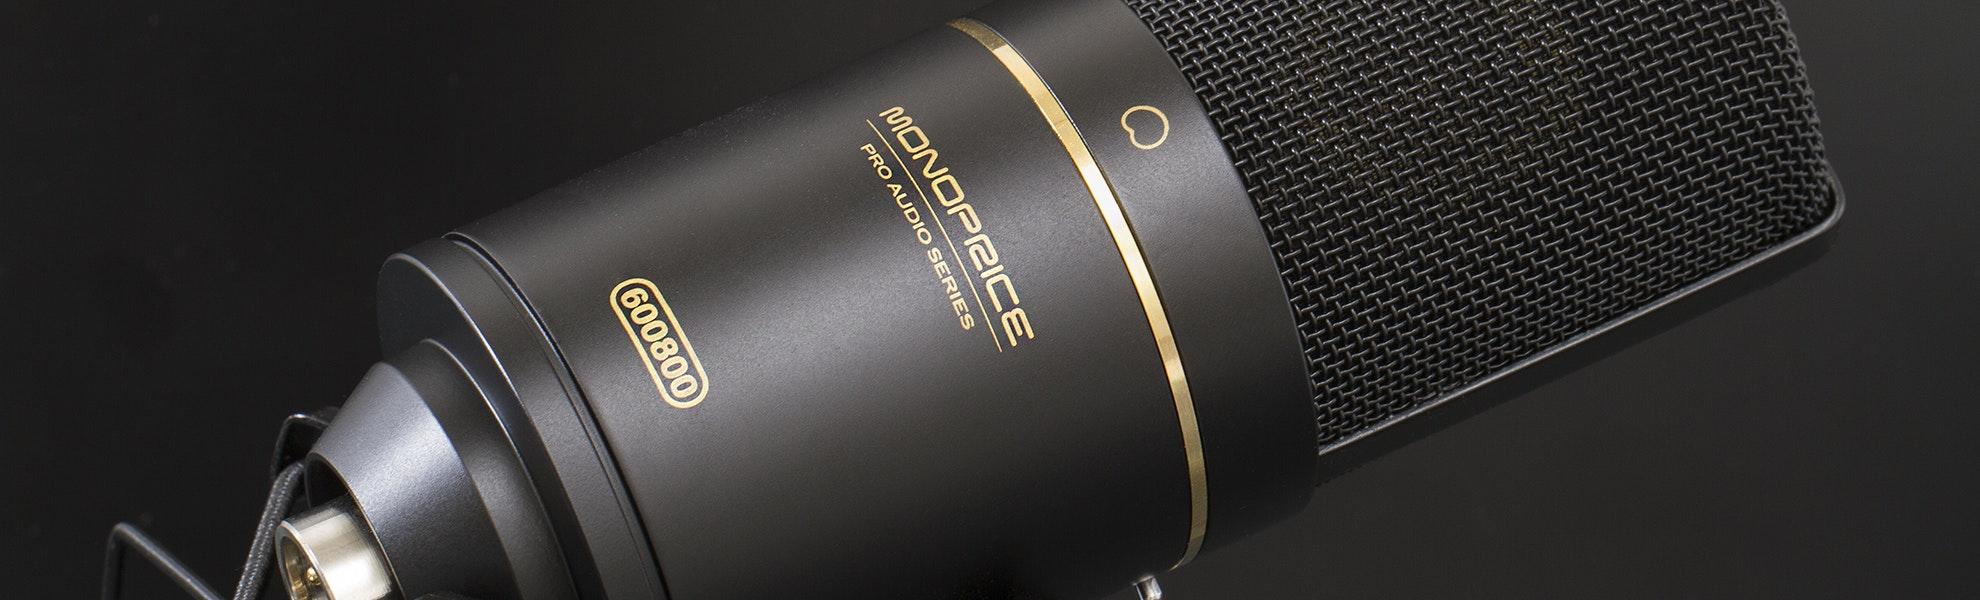 Monoprice Large Diaphragm Studio Microphone